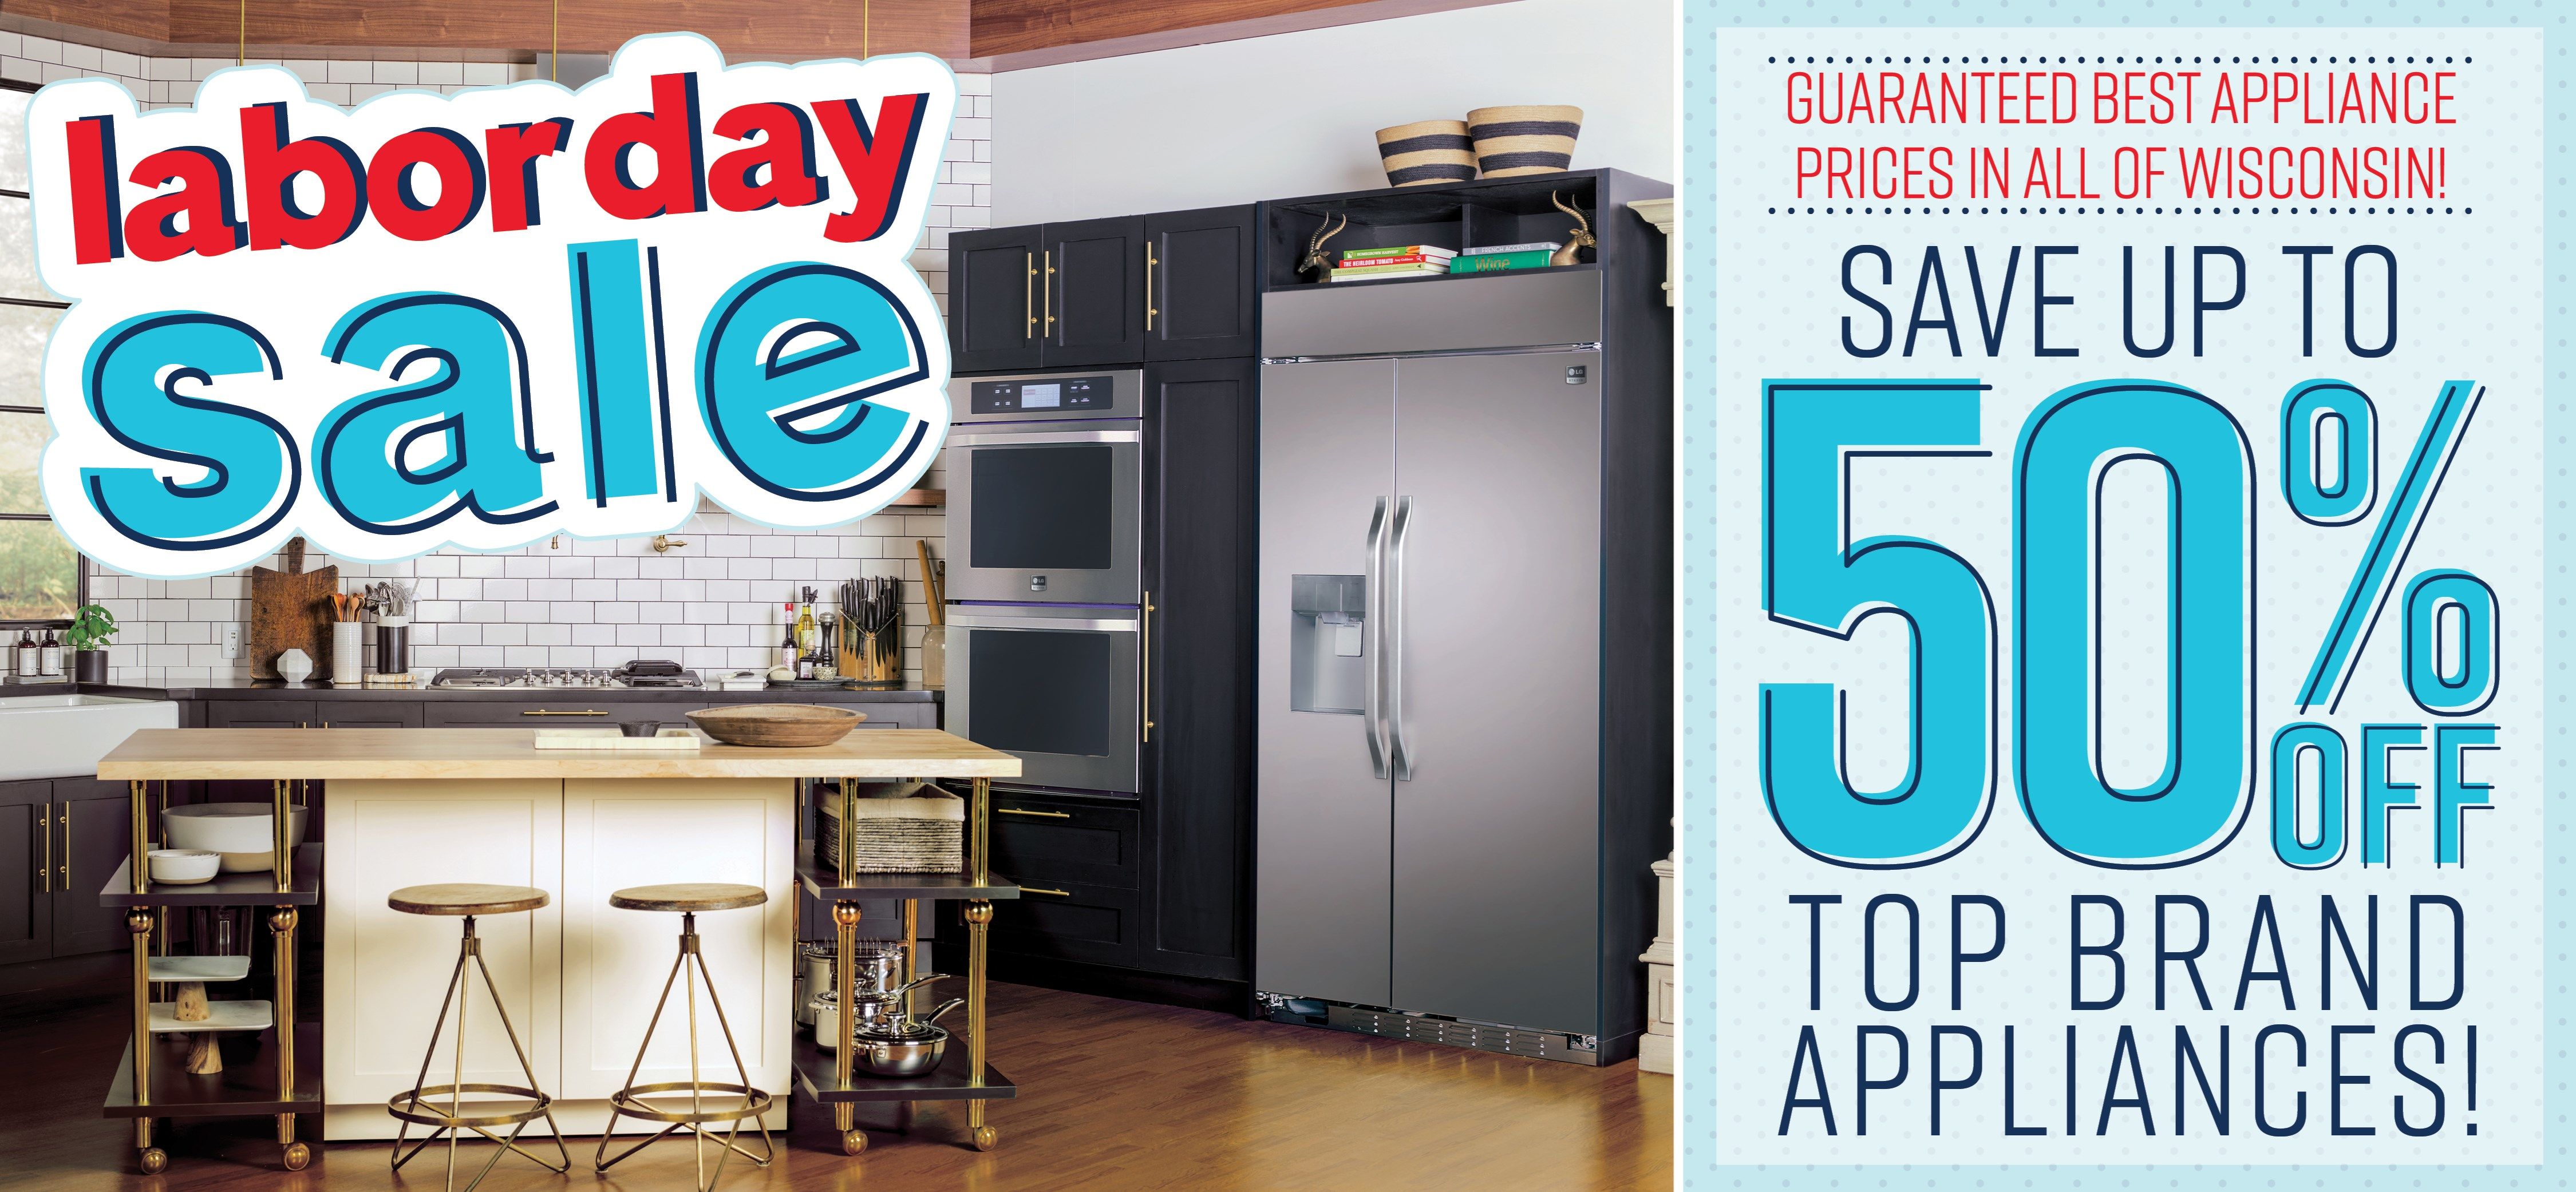 Furniture & ApplianceMart Labor Day Sale Last Chance